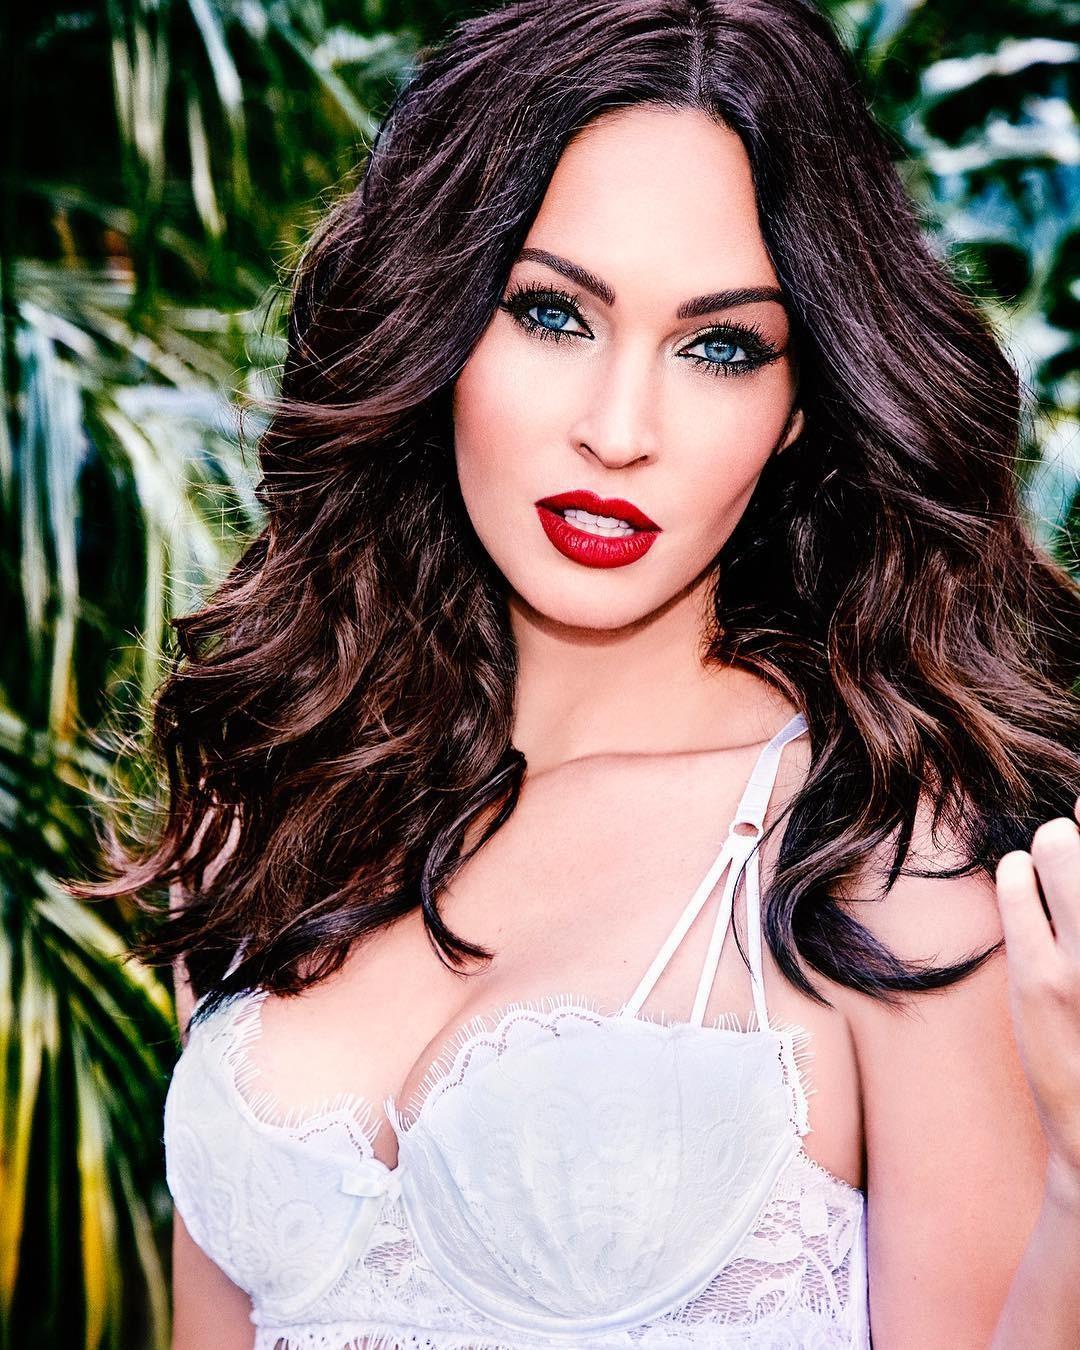 hot girl - Megan Fox